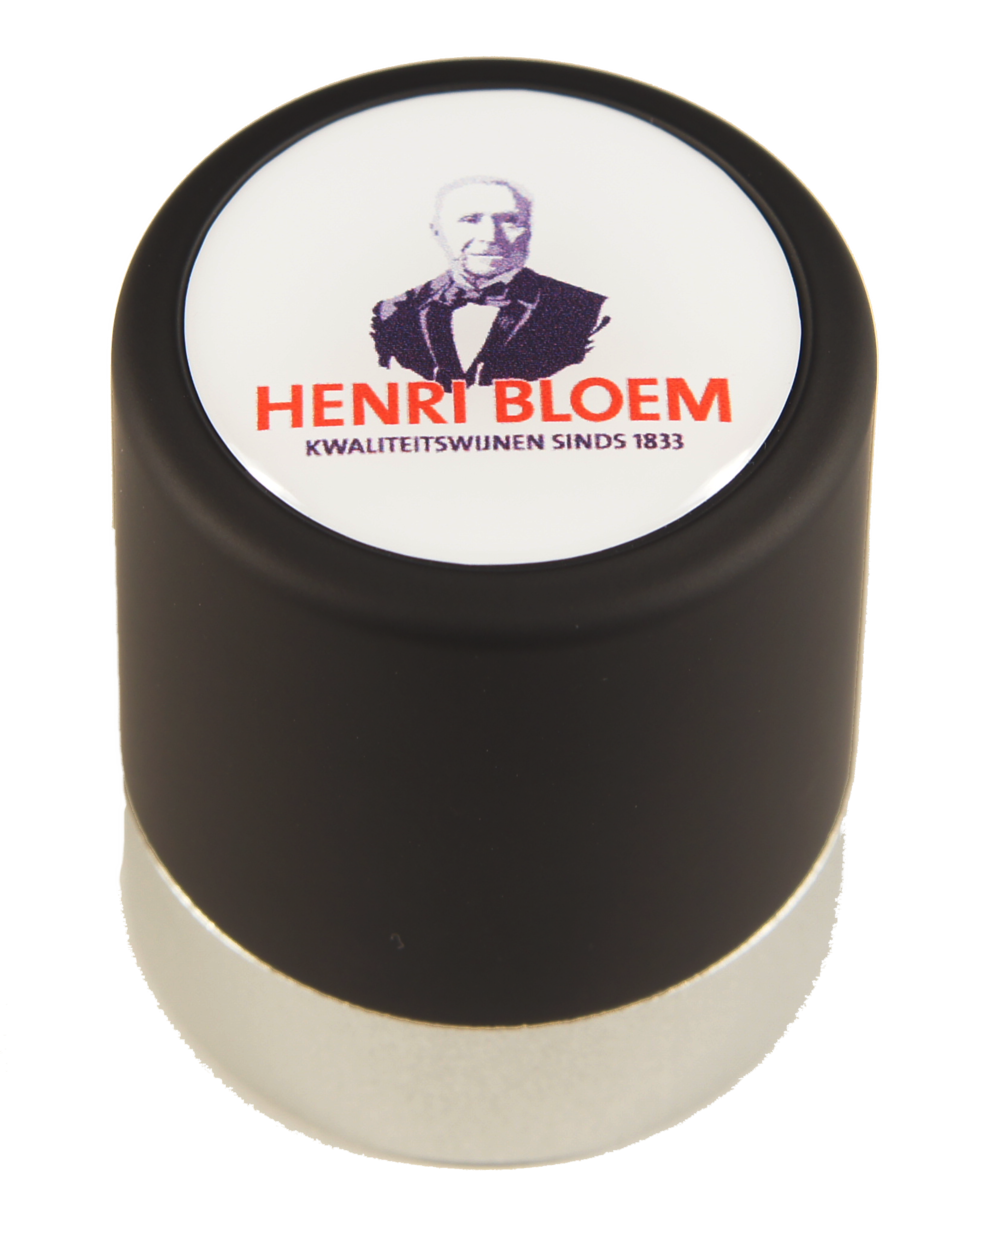 Champagne - Black - Silver - Henri Bloem.png